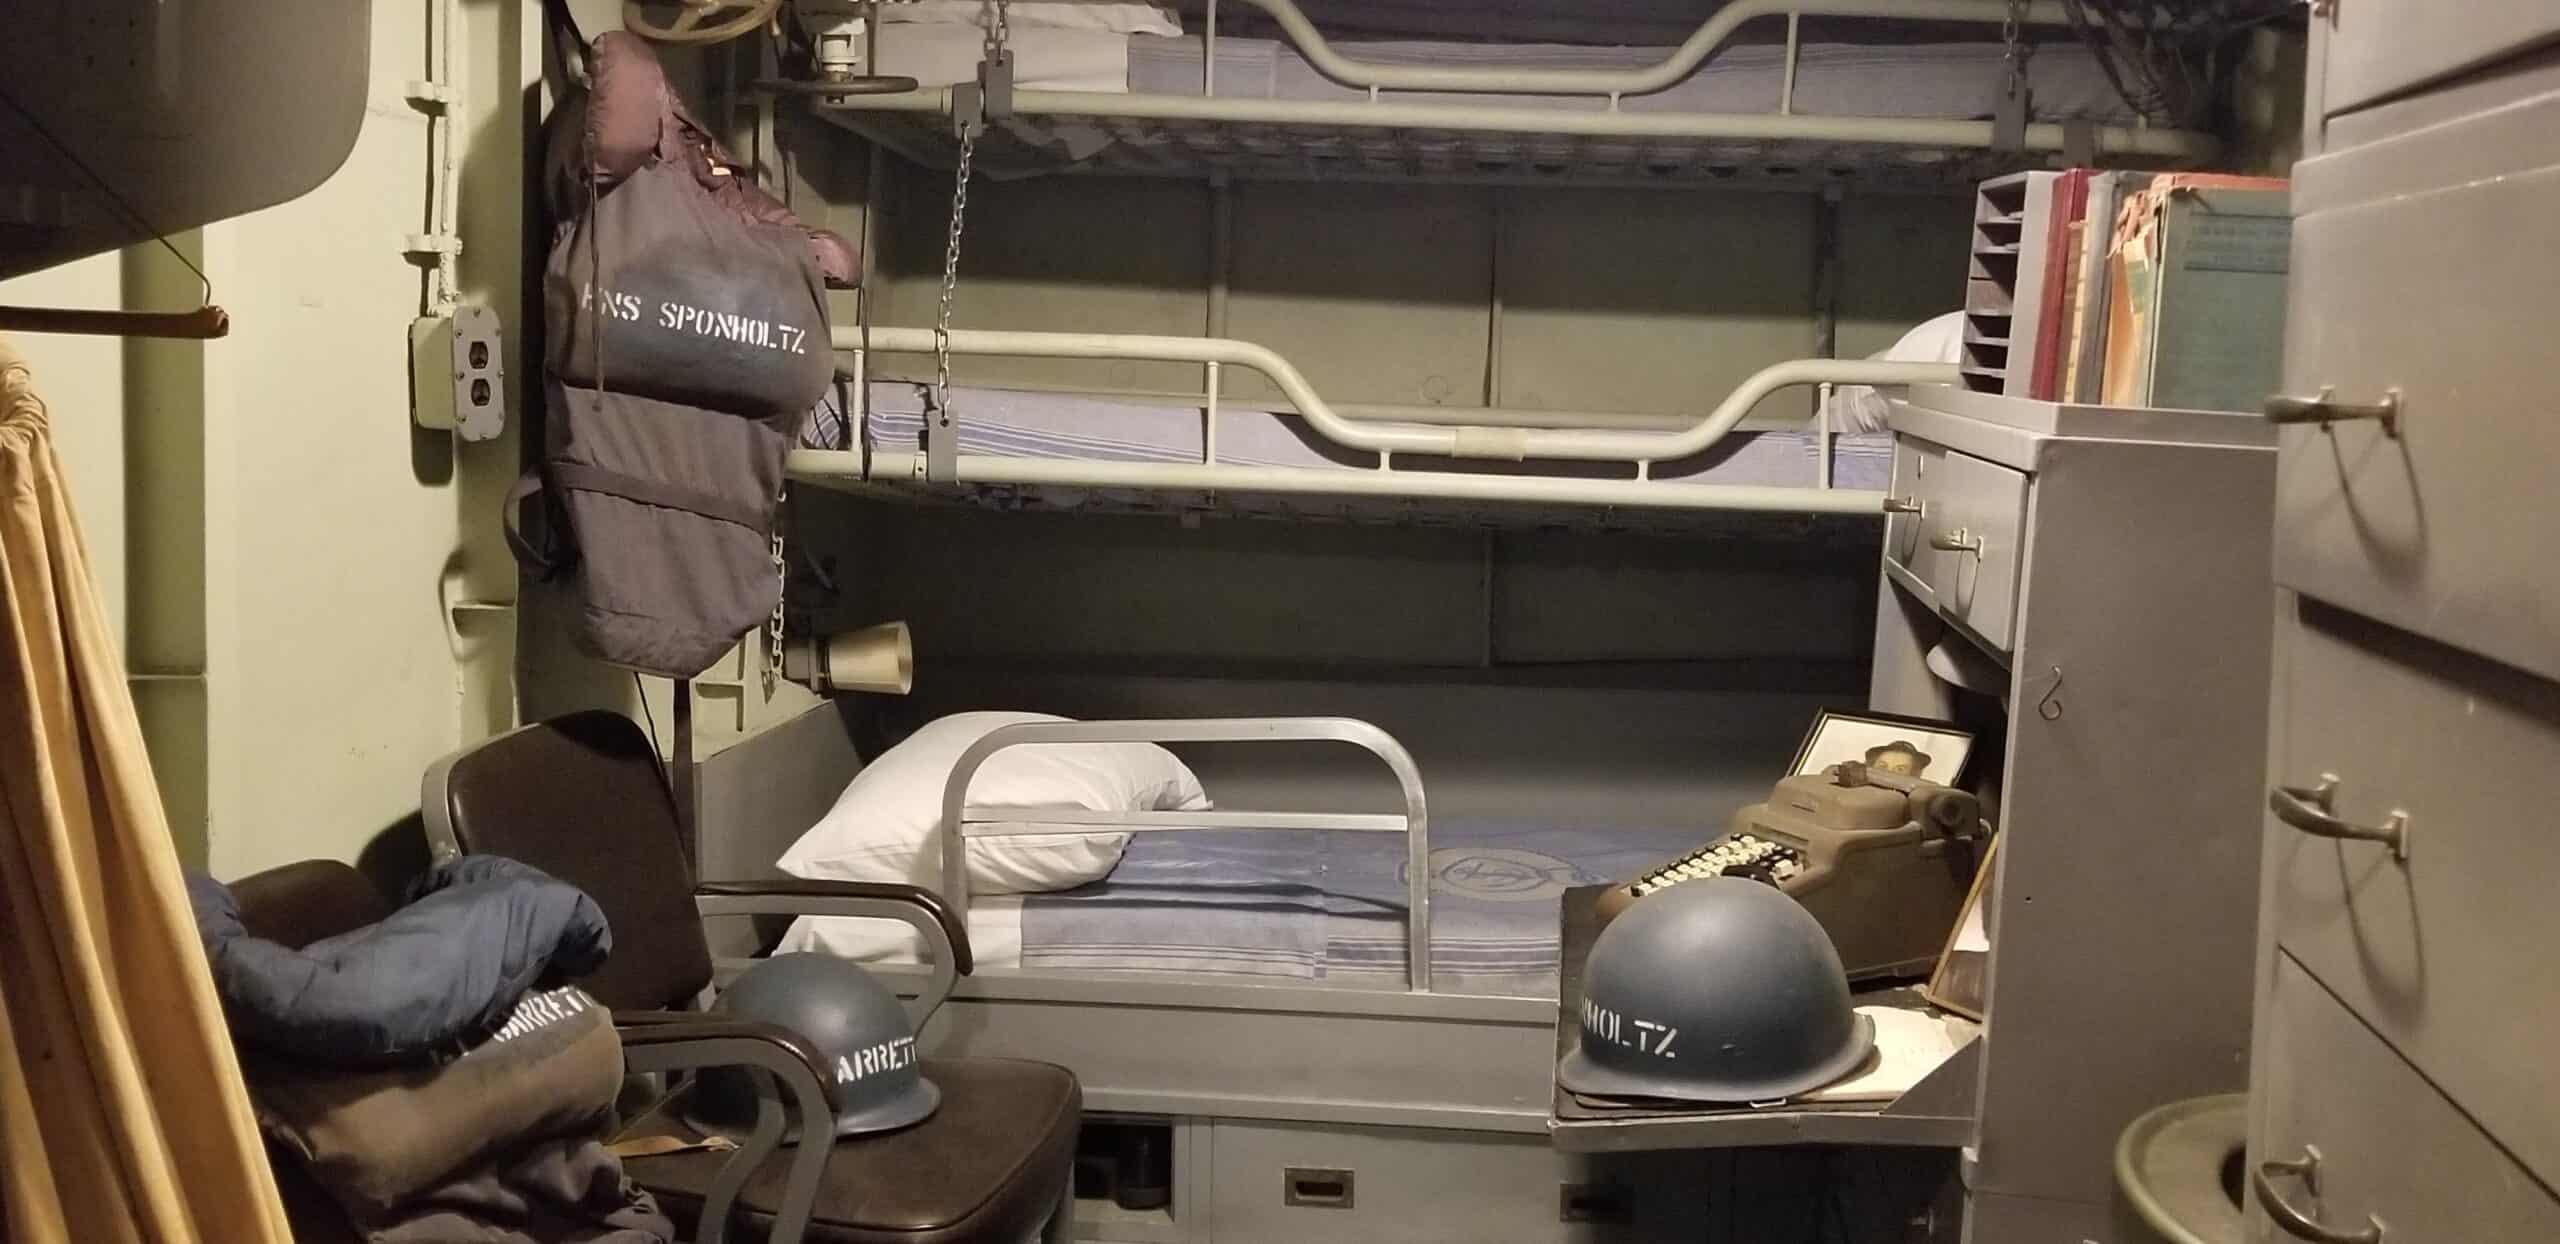 sleeping area on military warship